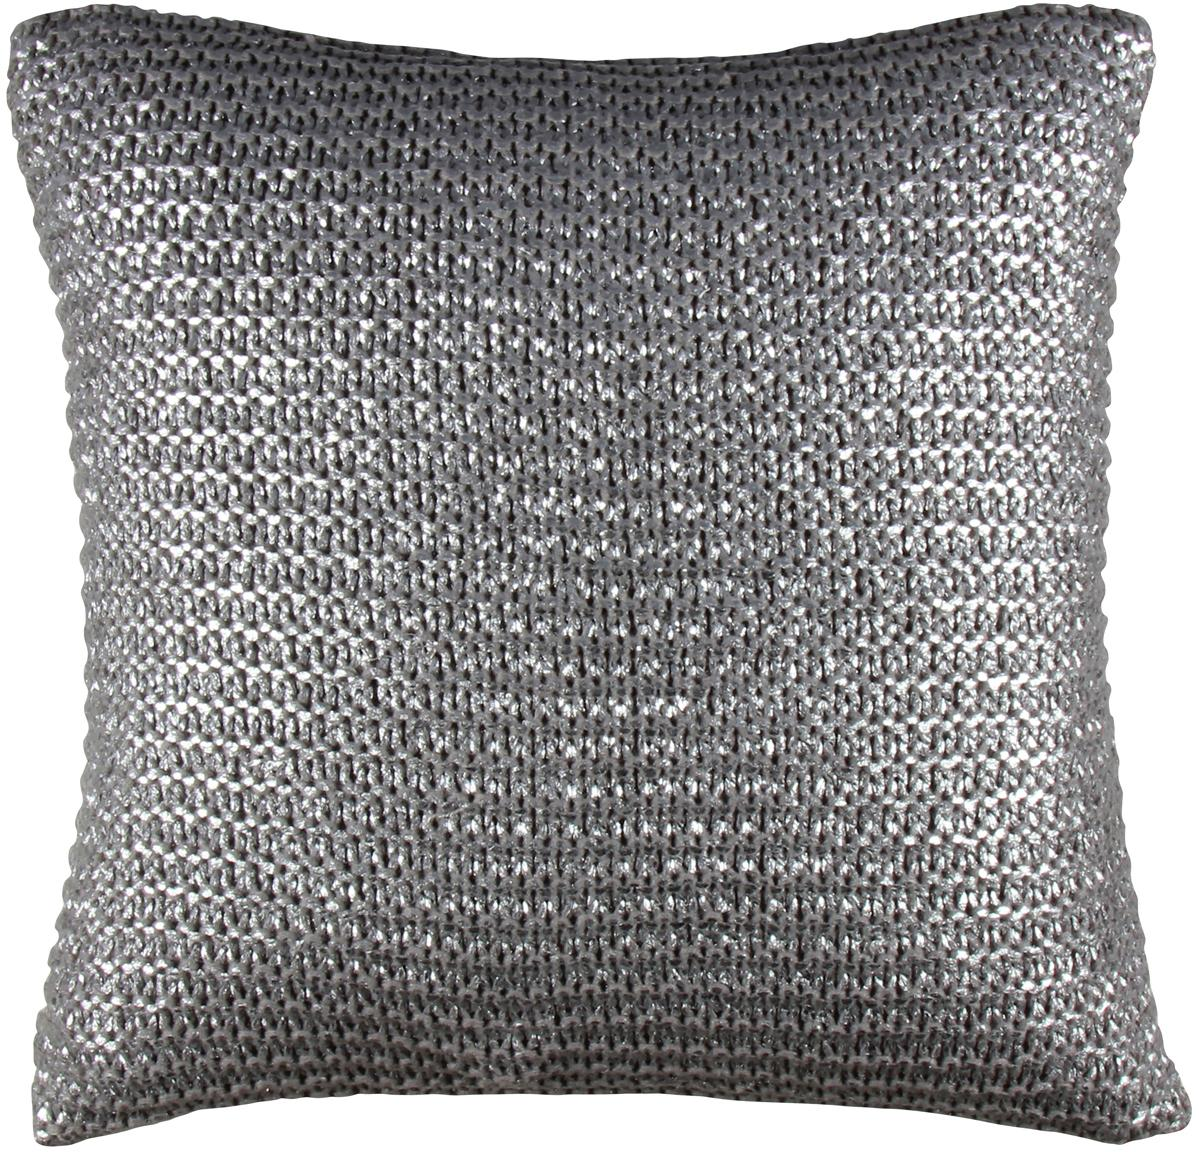 Federa arredo luccicante argento/oro Armour, Retro: cotone, Grigio, Larg. 45 x Lung. 45 cm